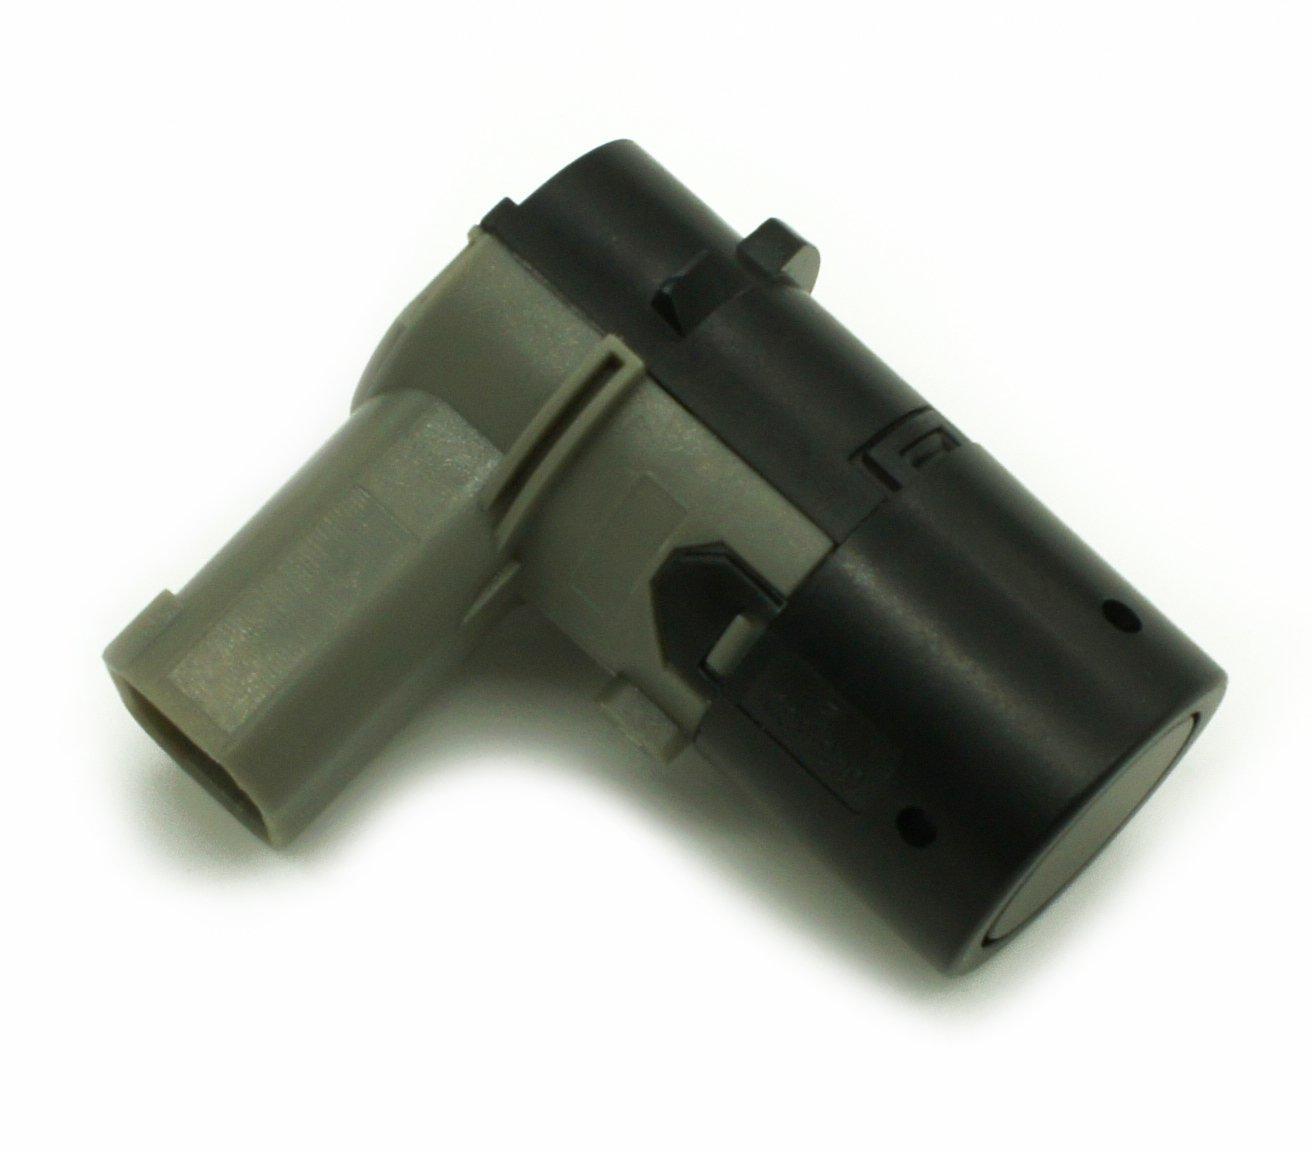 Electronicx Auto PDC Parksensor Ultraschall Sensor Parktronic Parksensoren Parkhilfe Parkassistent 66202180149